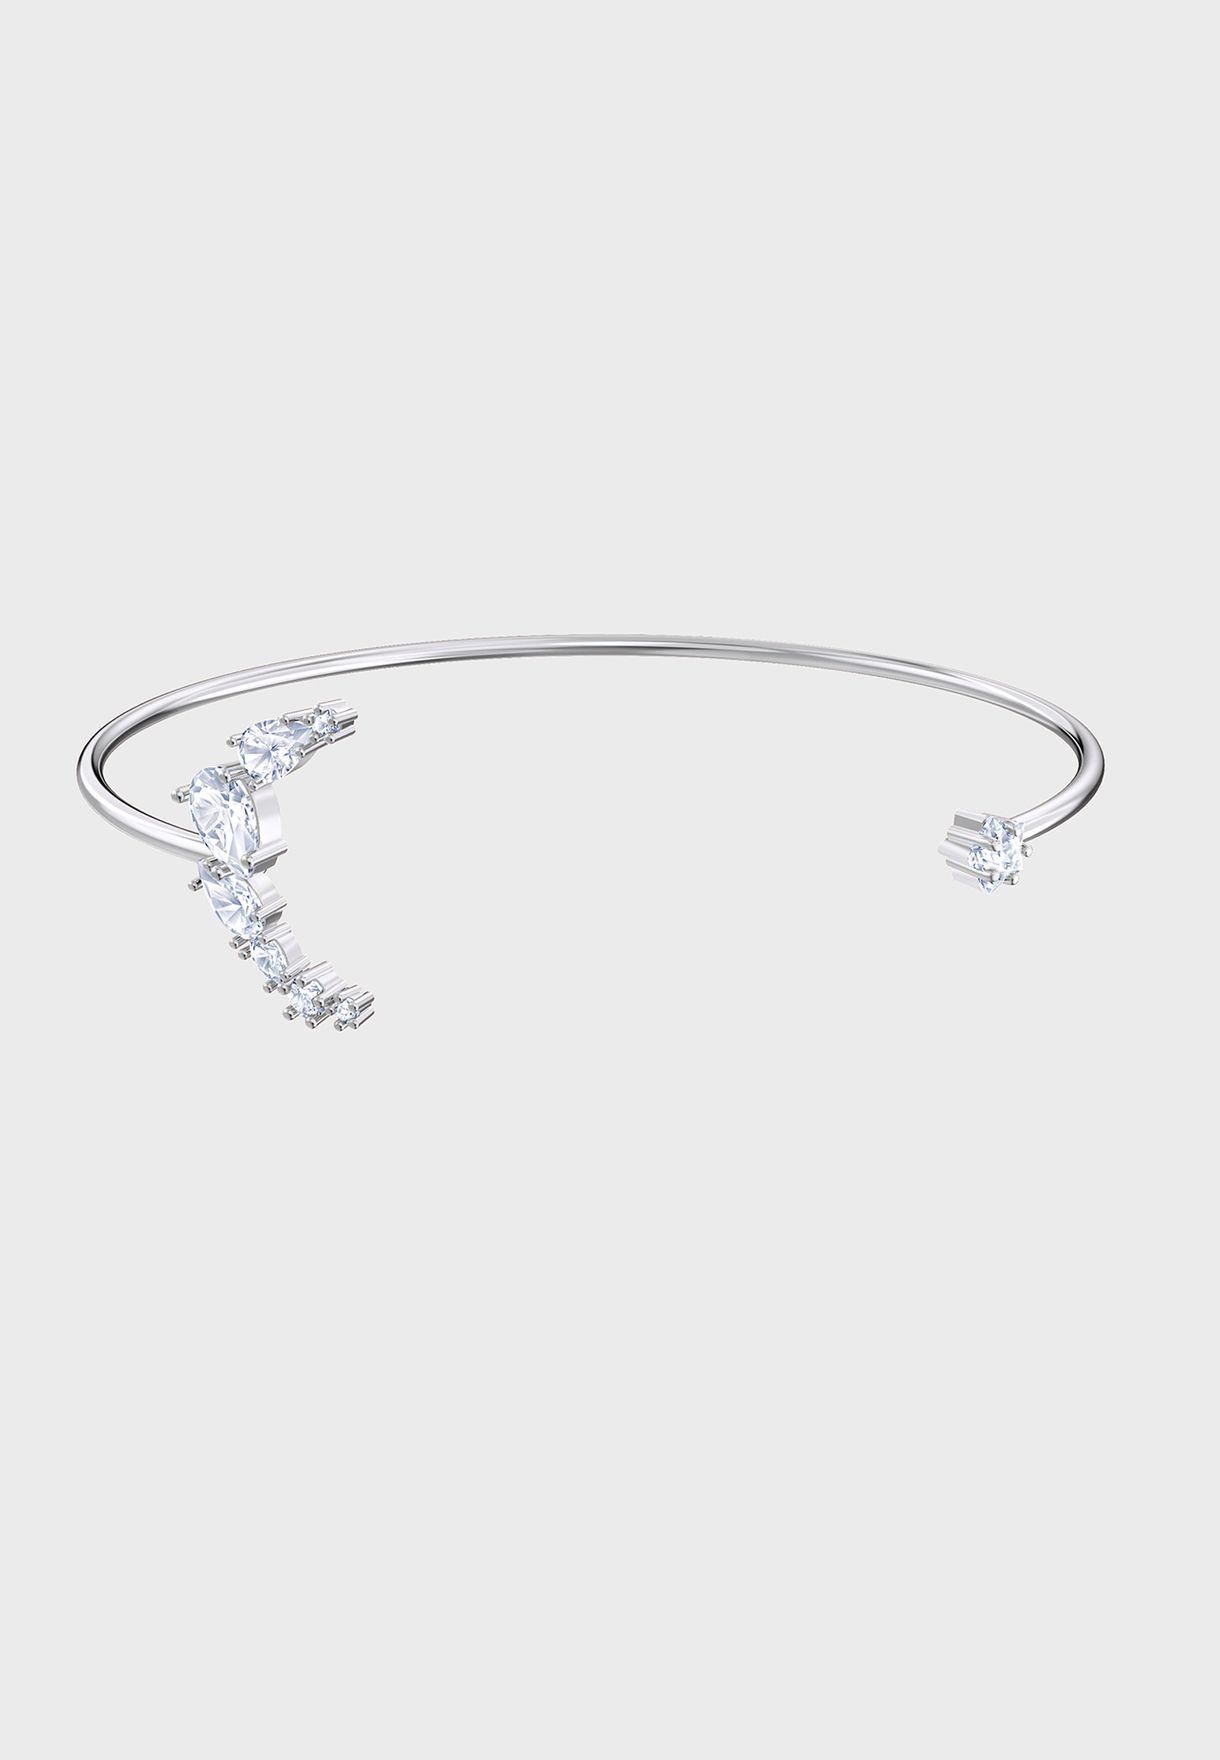 Moonsun Moon Cuff Bracelet